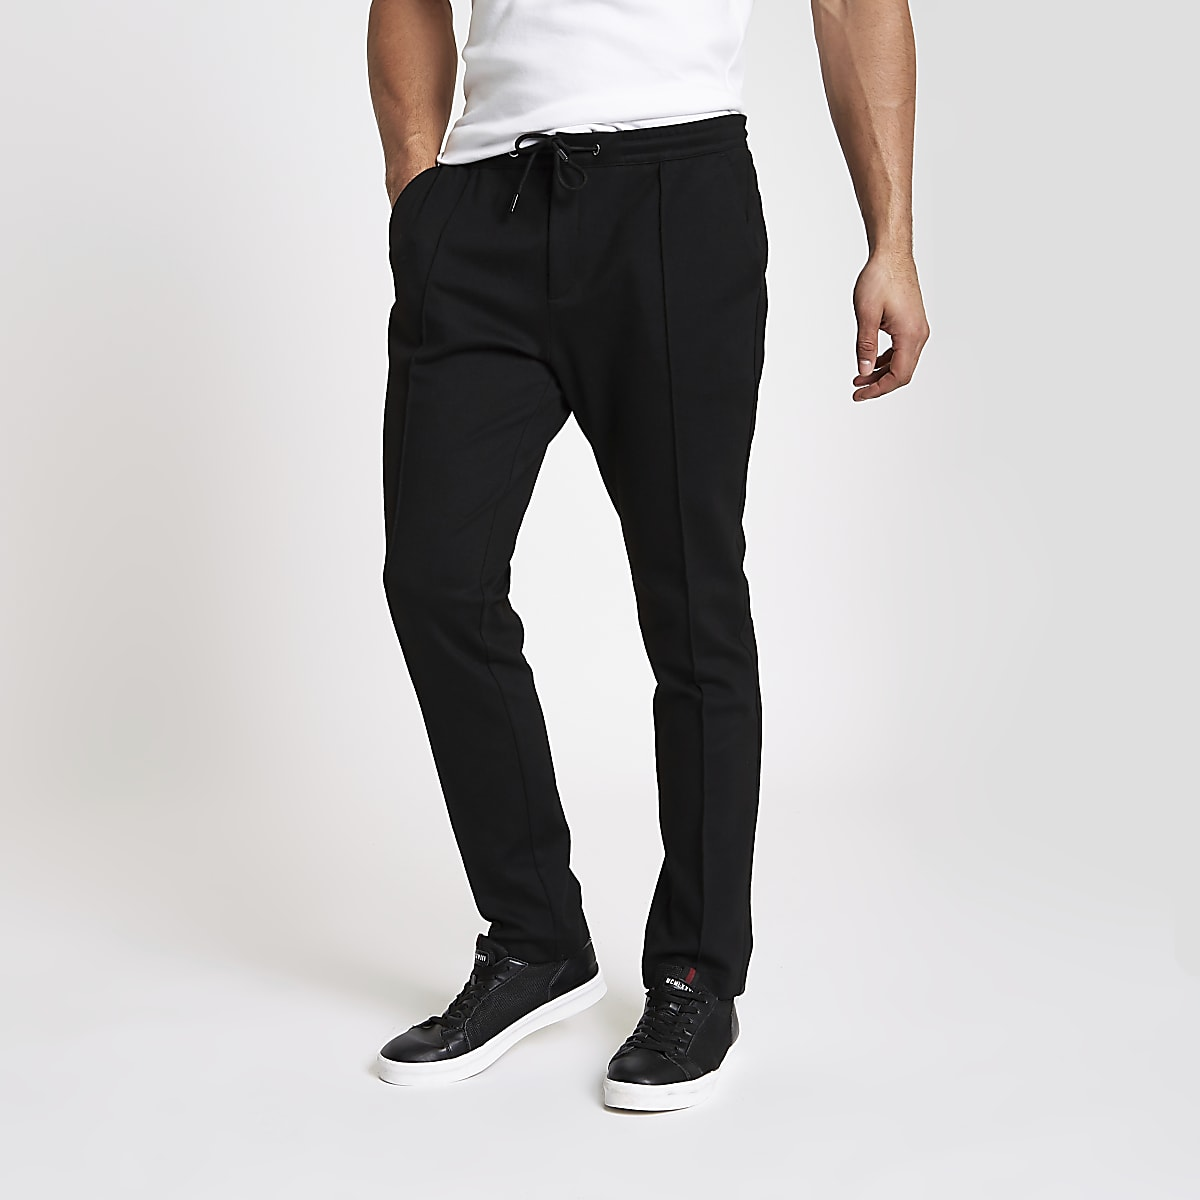 Black skinny fit jogger pants